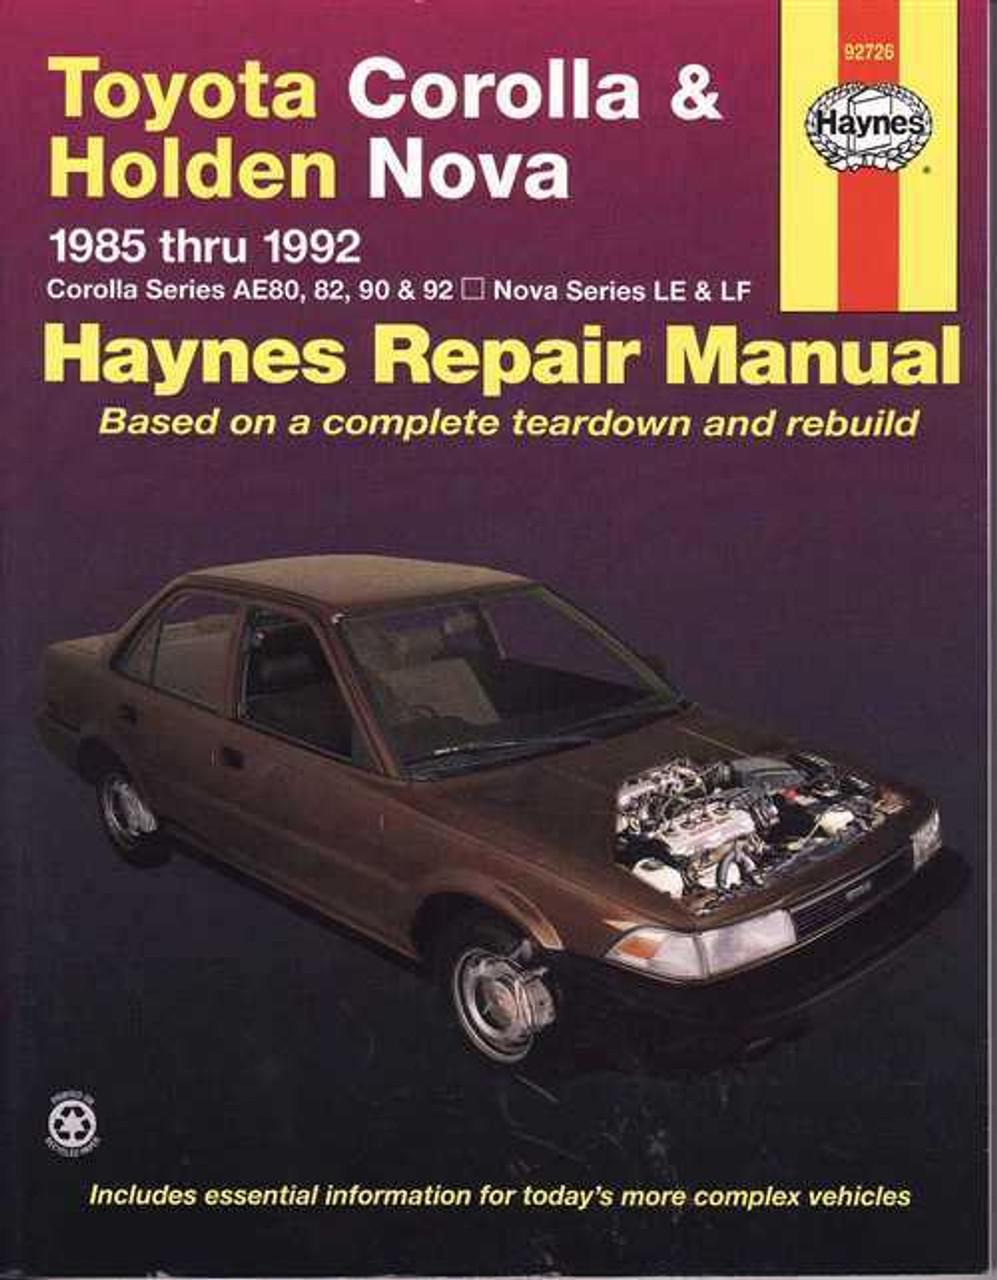 toyota corolla ae80 82 90 92 and holden nova le lf workshop manual rh automotobookshop com au 1990 Toyota Corolla Specs 1990 Toyota Corolla Owners Manual